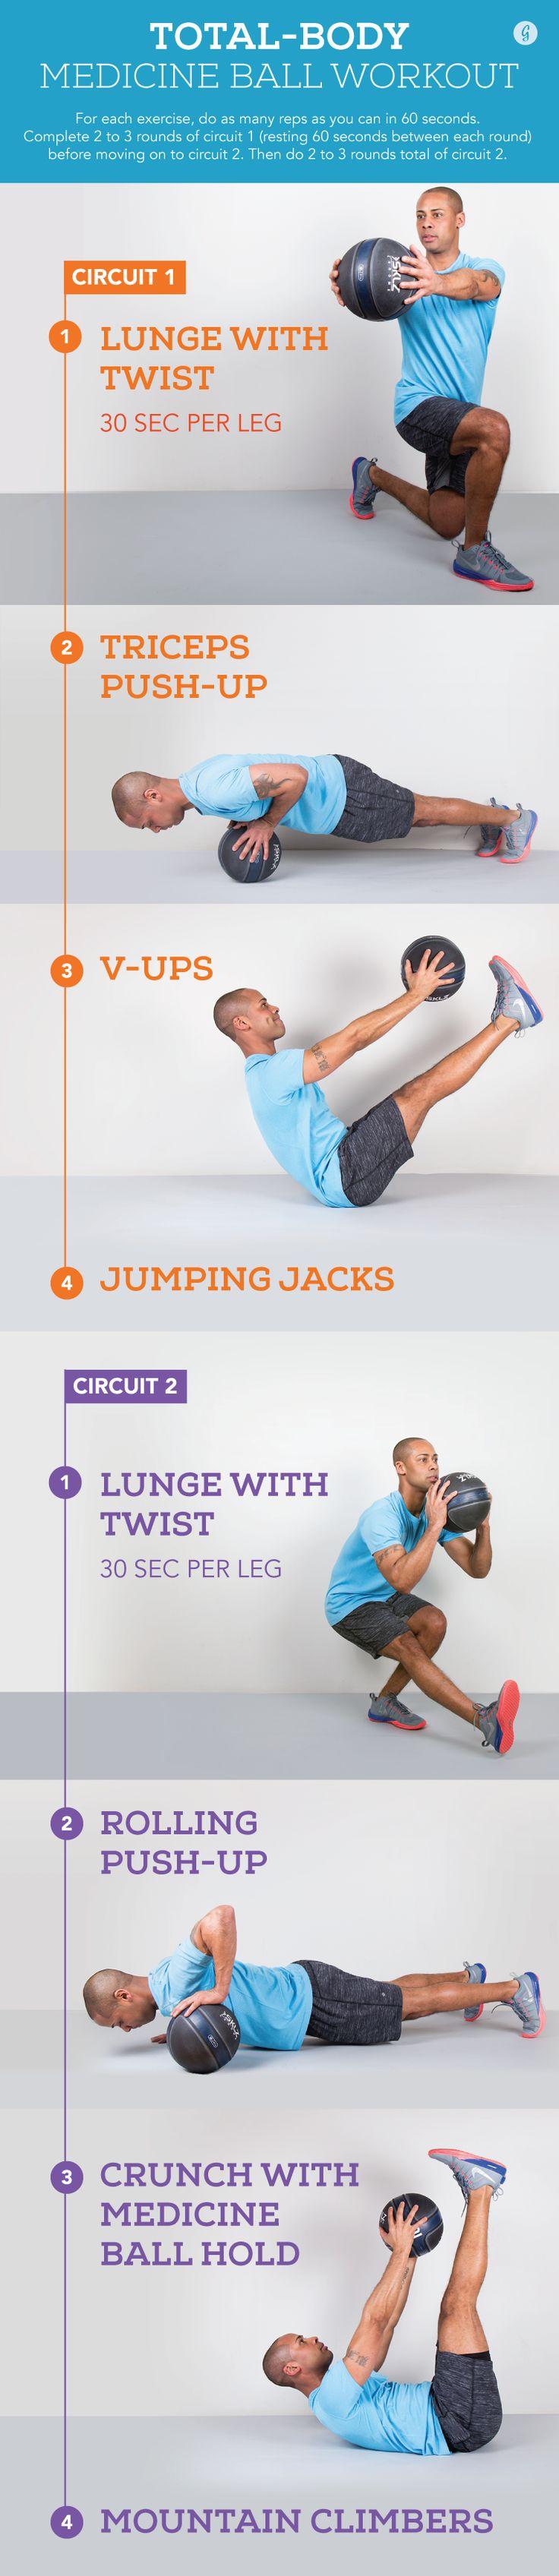 Total-Body Medicine Ball Workout  #workout #totalbody #exercises